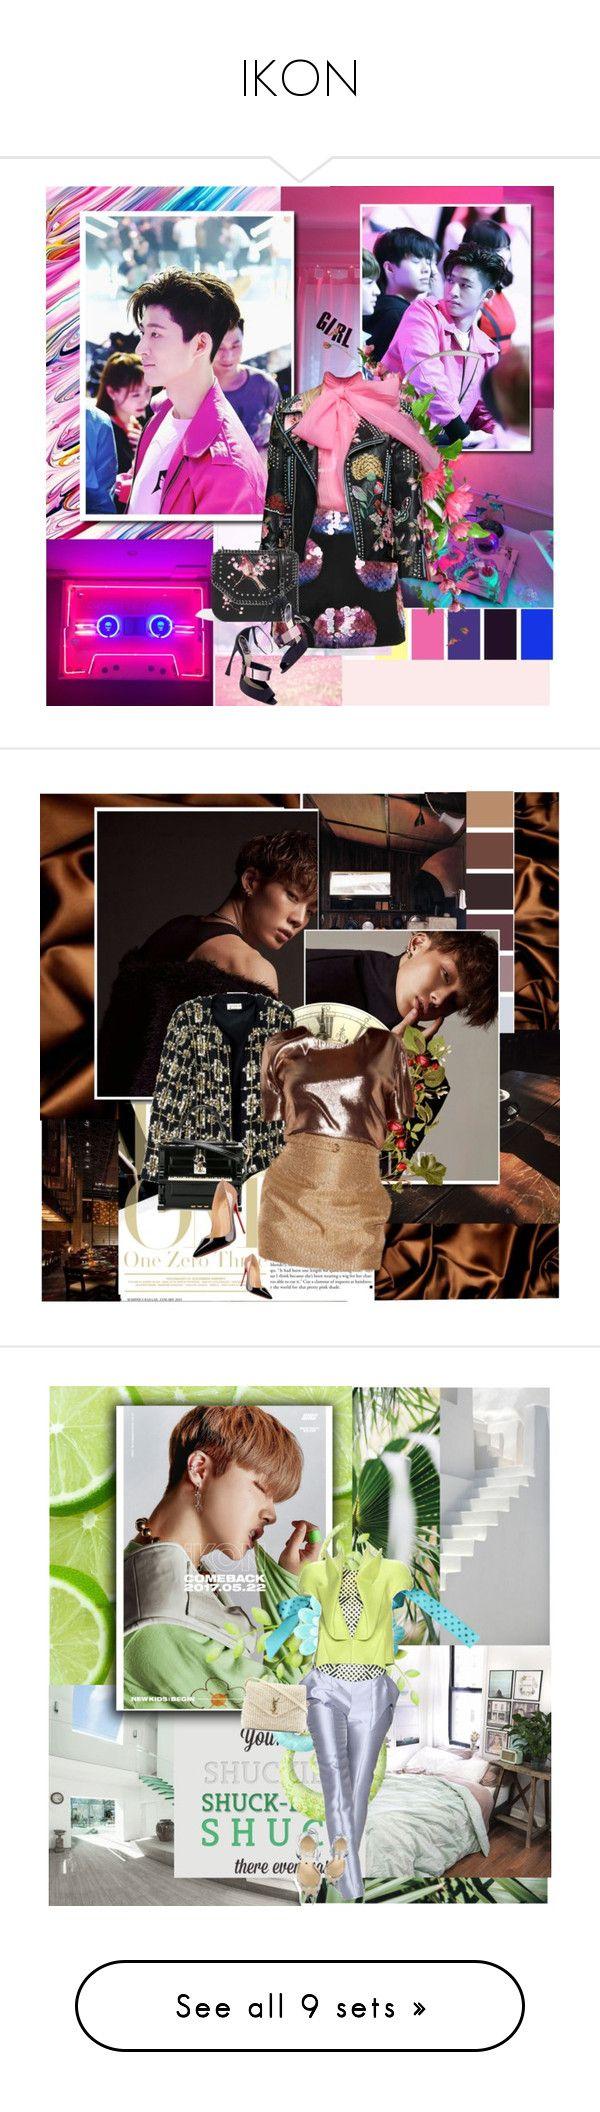 """IKON"" by janjanzira-1 ❤ liked on Polyvore featuring GALA, Opening Ceremony, STELLA McCARTNEY, But Another Innocent Tale, Kershaw, Dries Van Noten, Christian Louboutin, Dolce&Gabbana, Bionda Castana and Yves Saint Laurent"